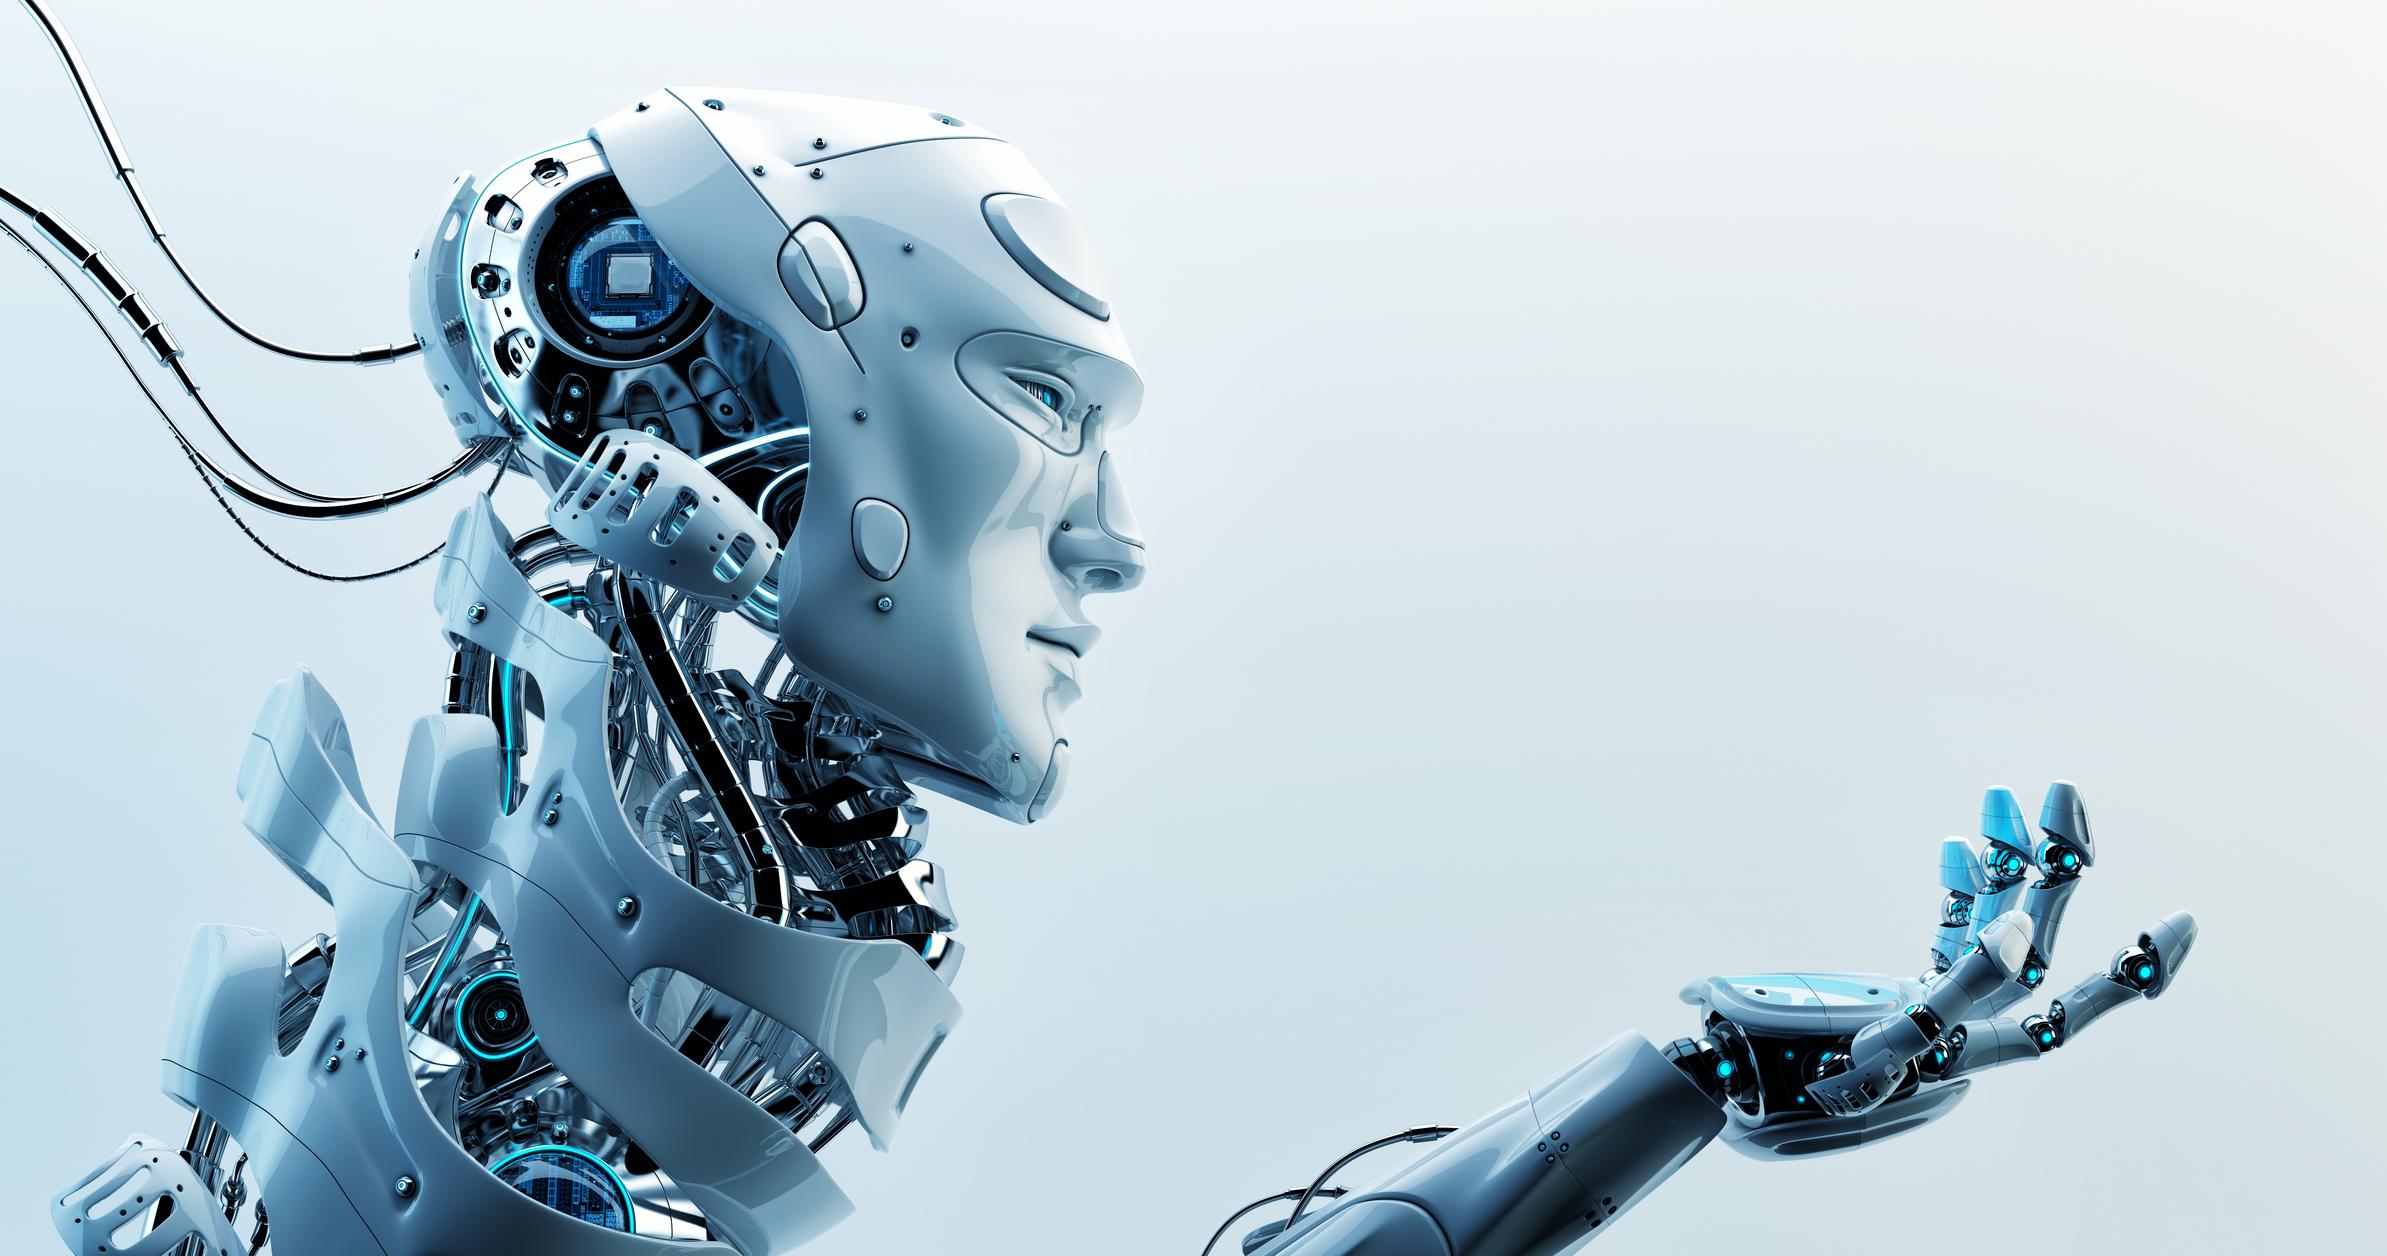 Juridisch Advies AI, Machine Learning, Robotica, Blockchain en Auteursrecht